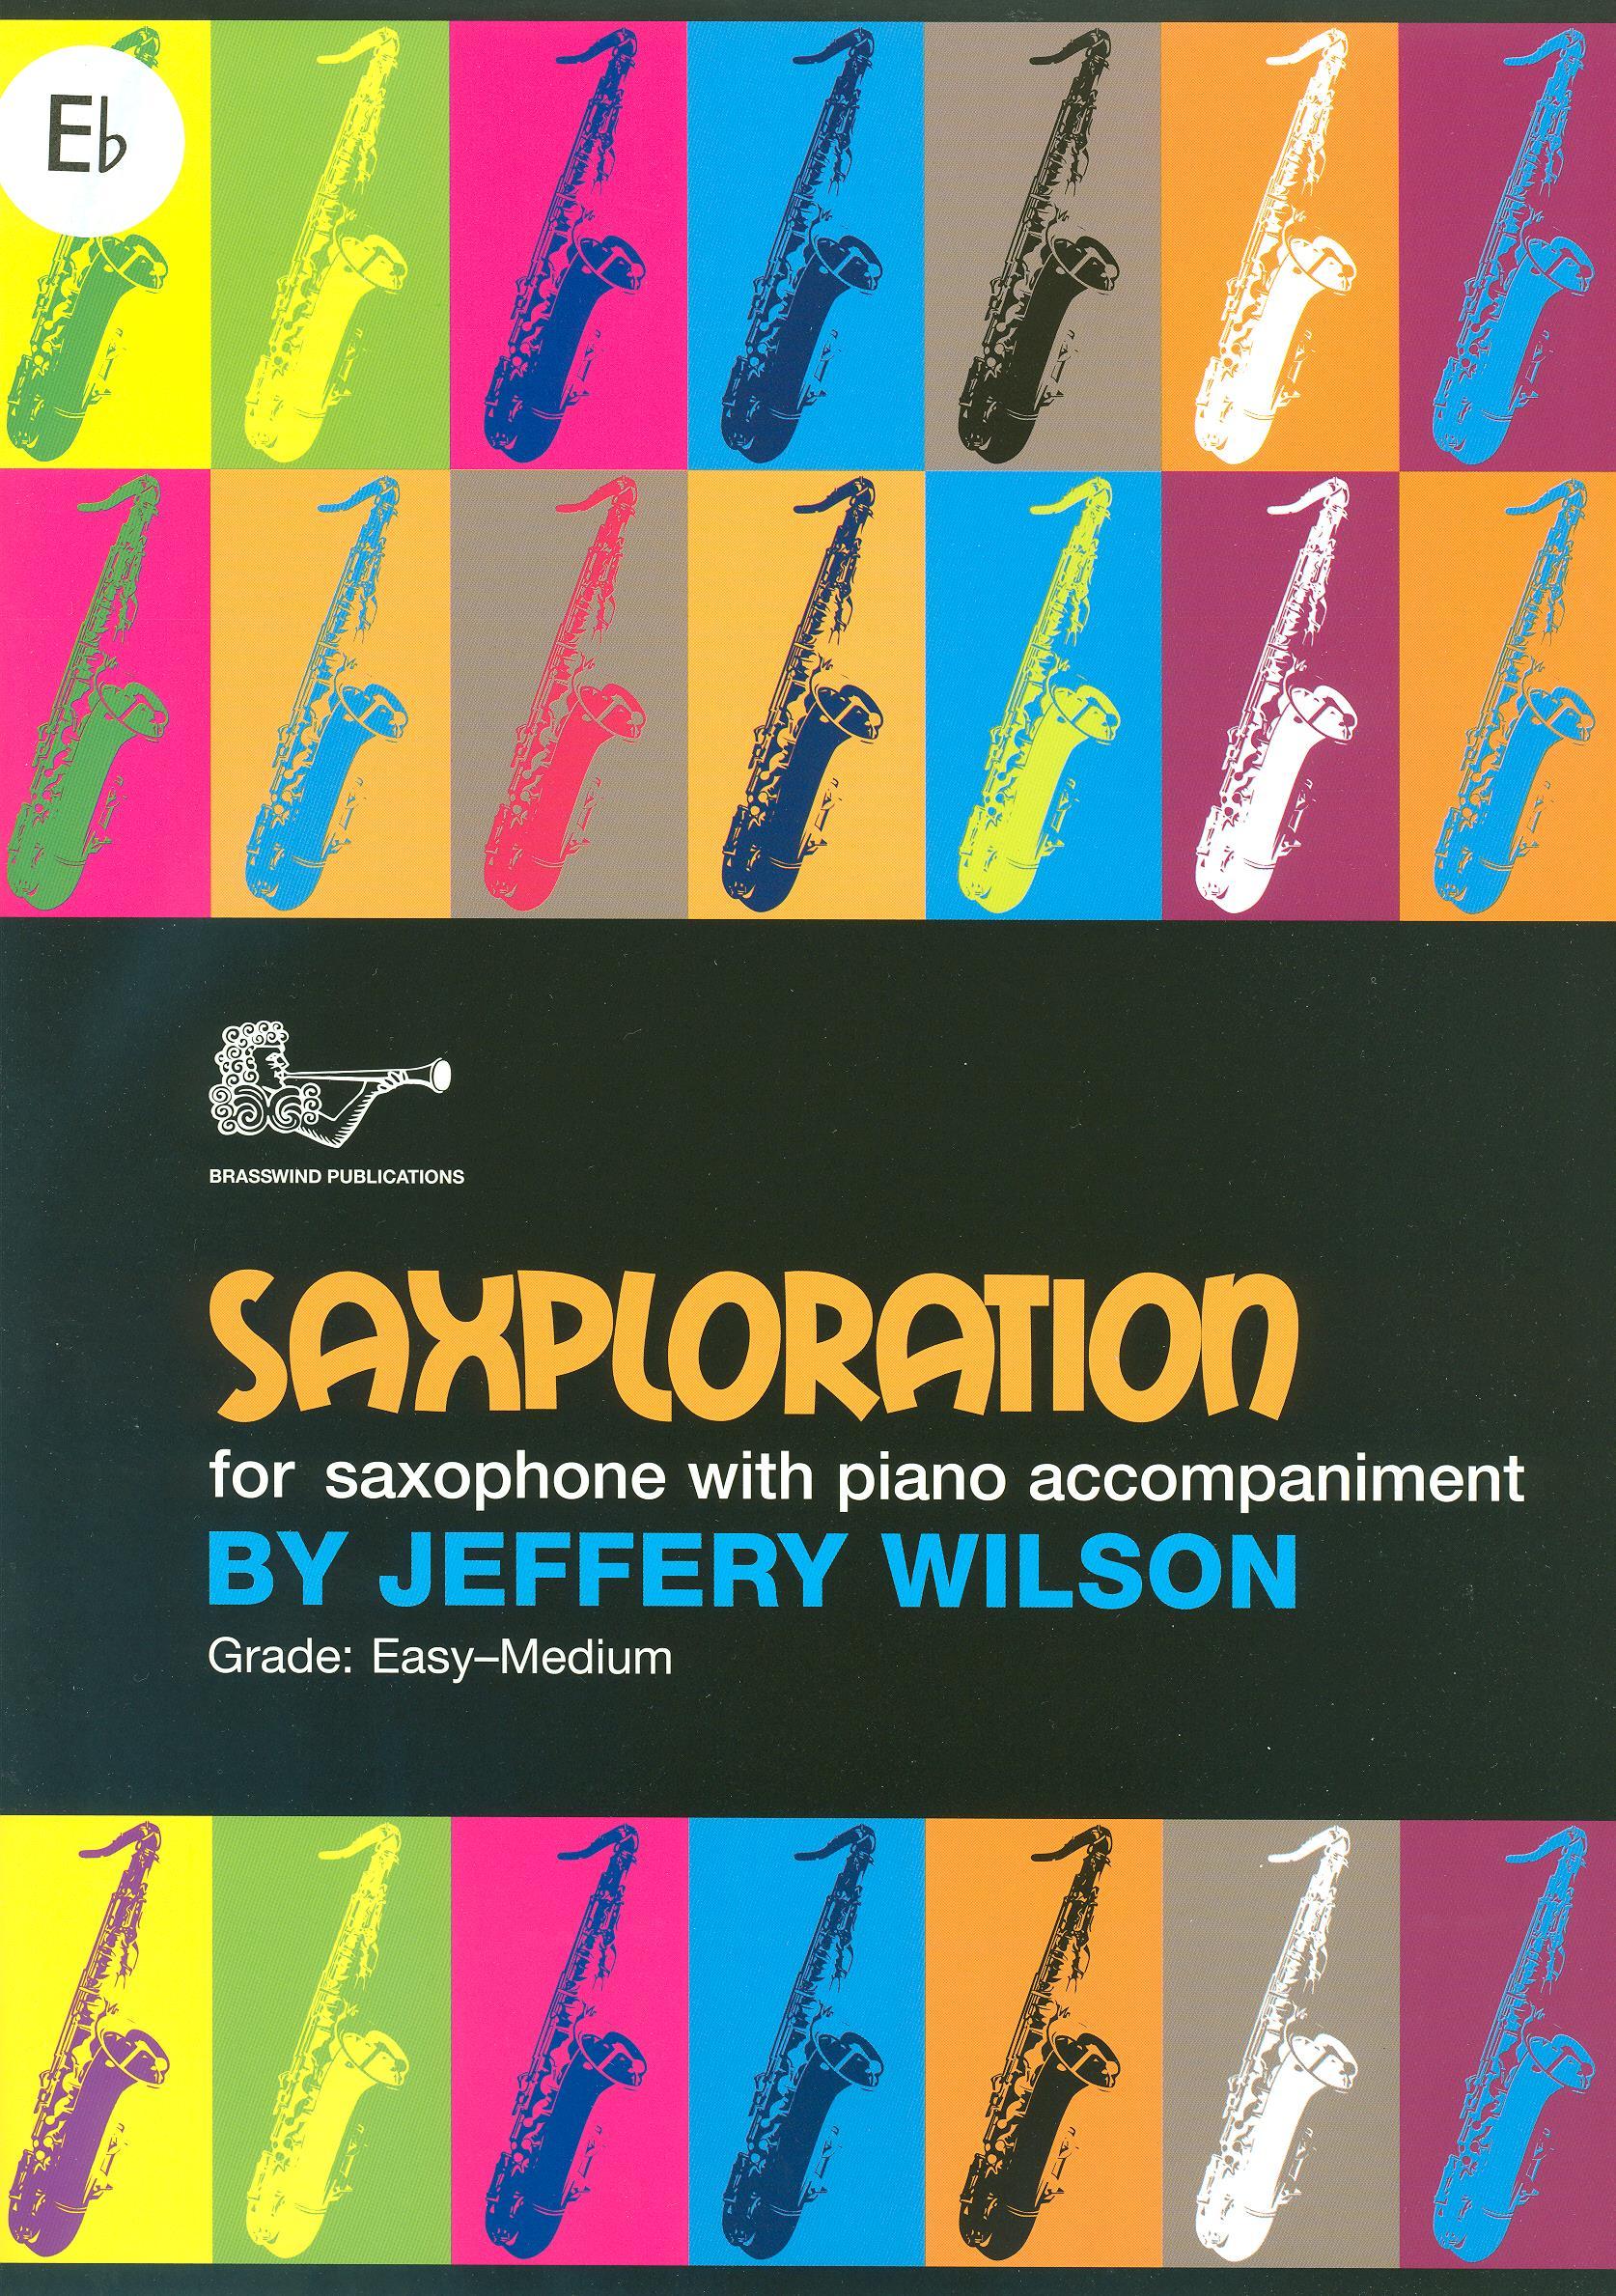 Saxploration image